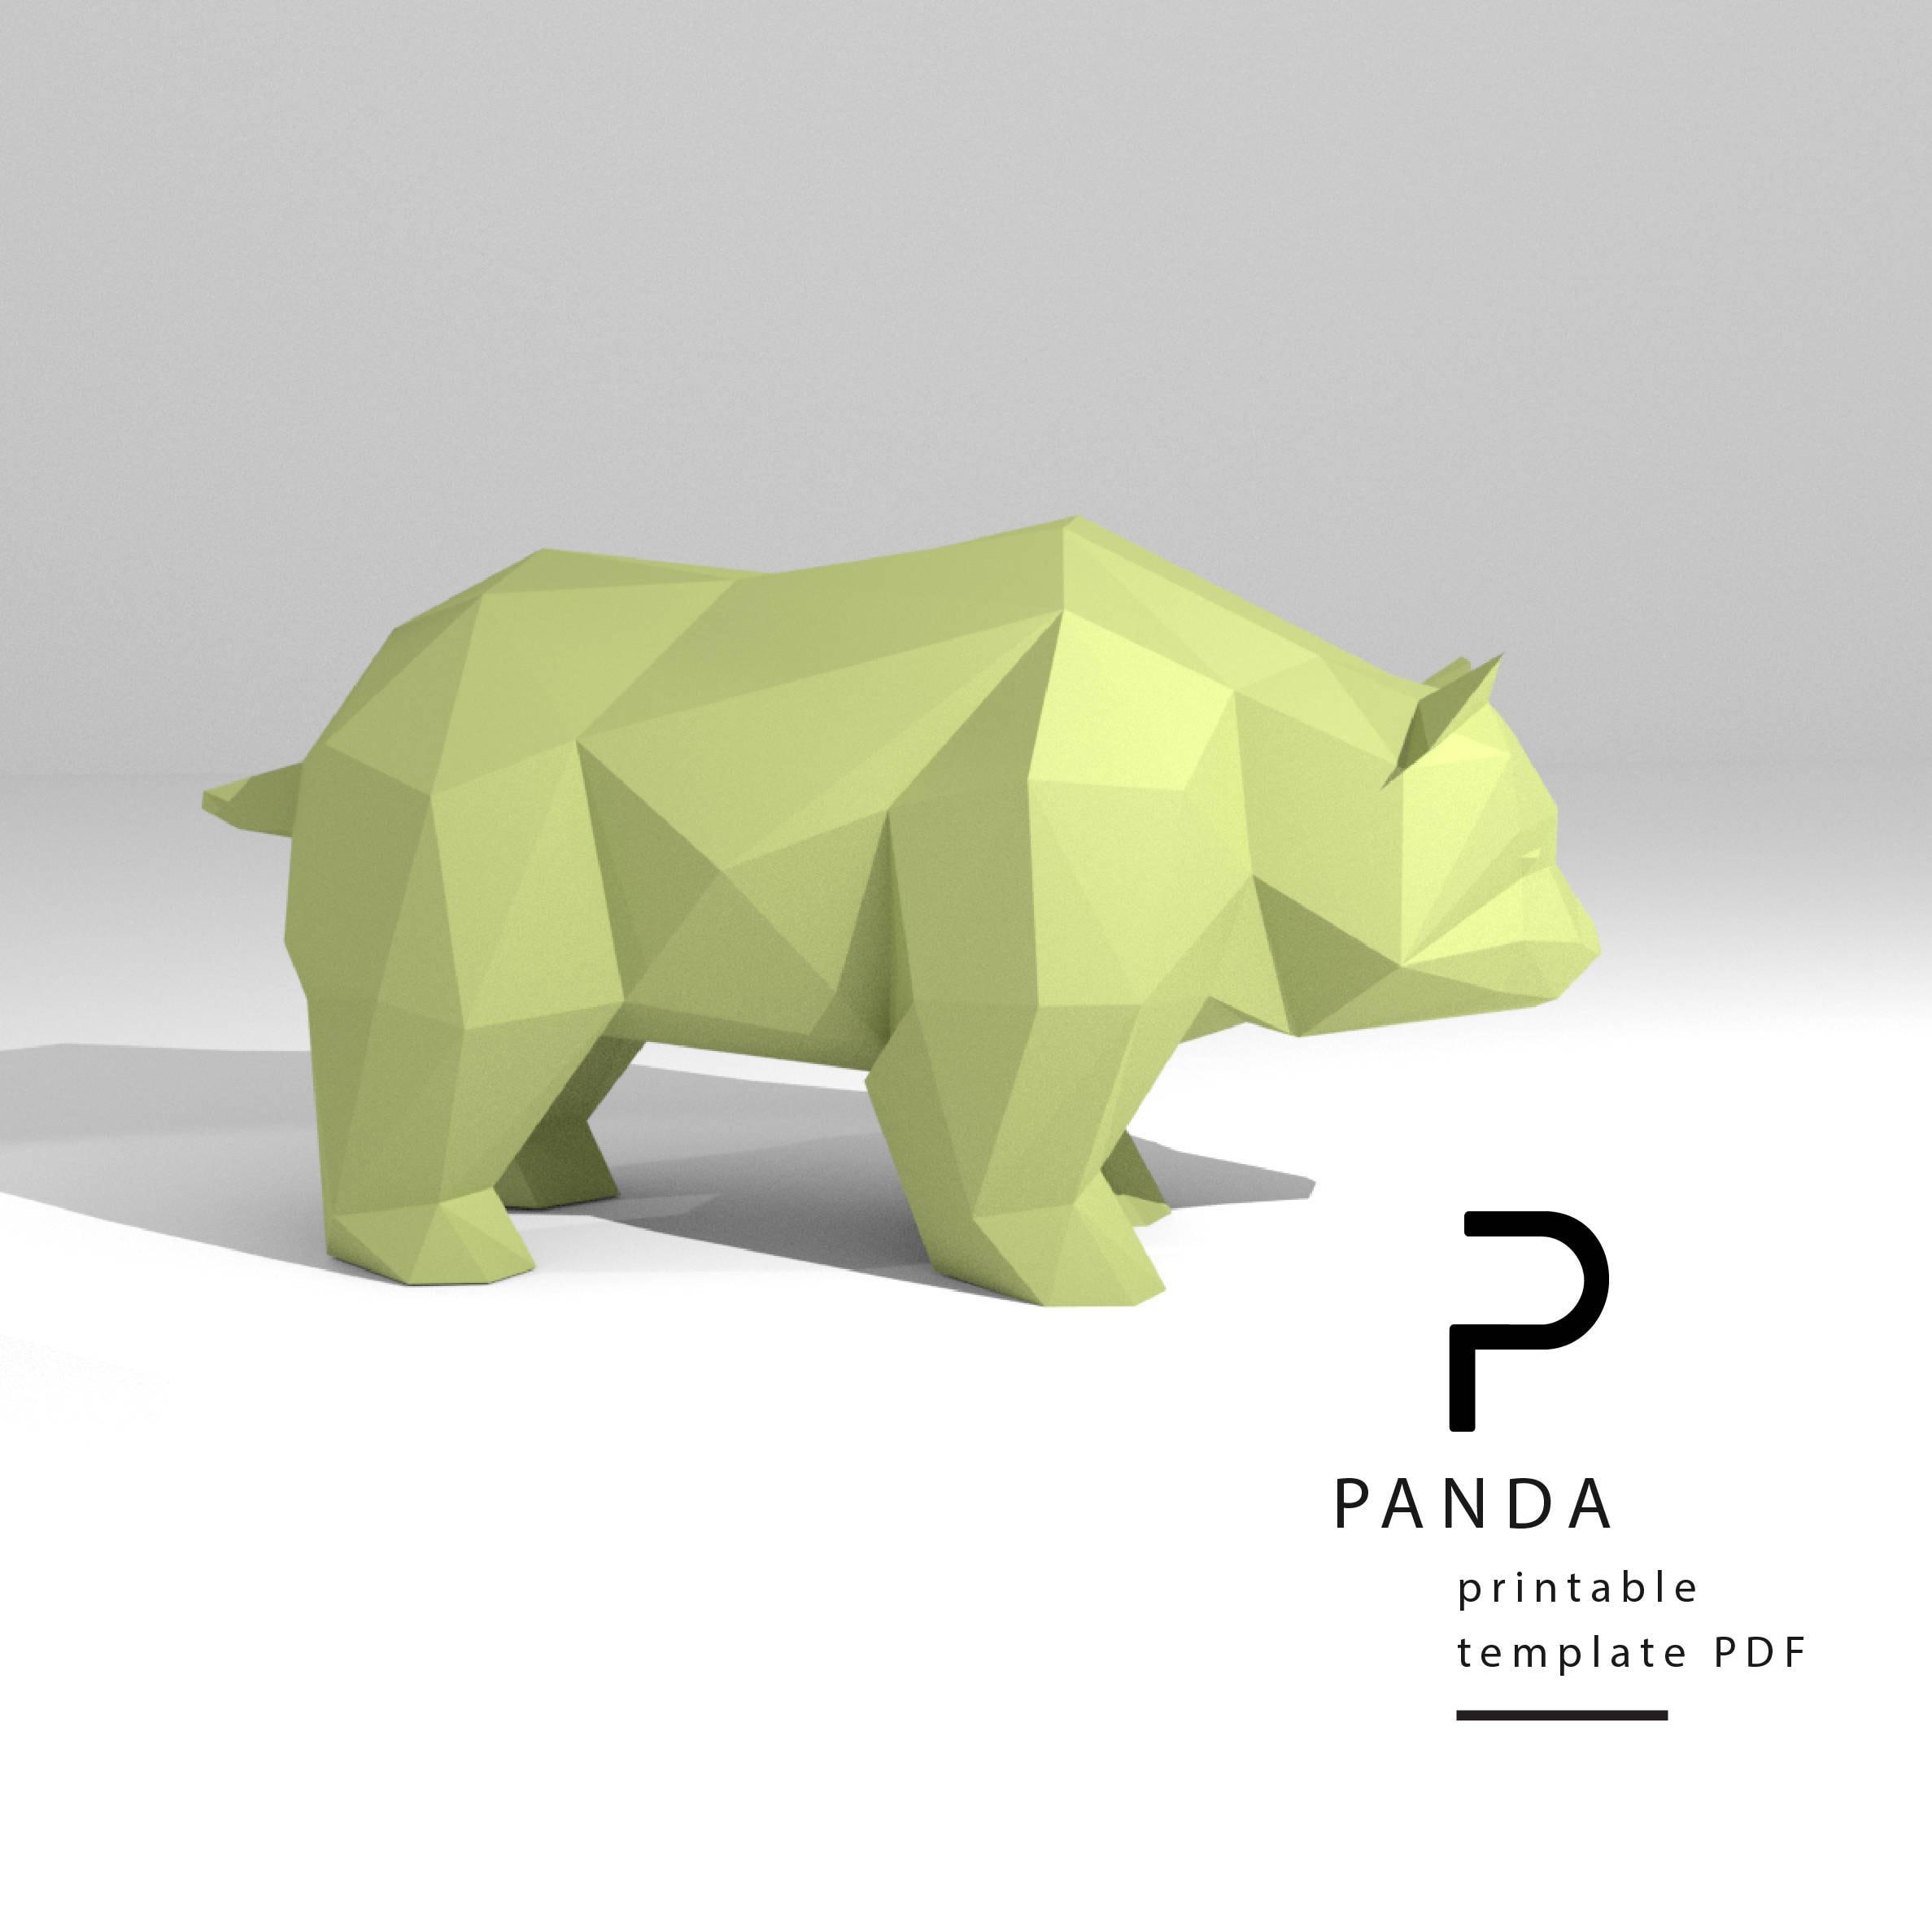 Printable DIY template PDF. Panda low poly paper model   Etsy